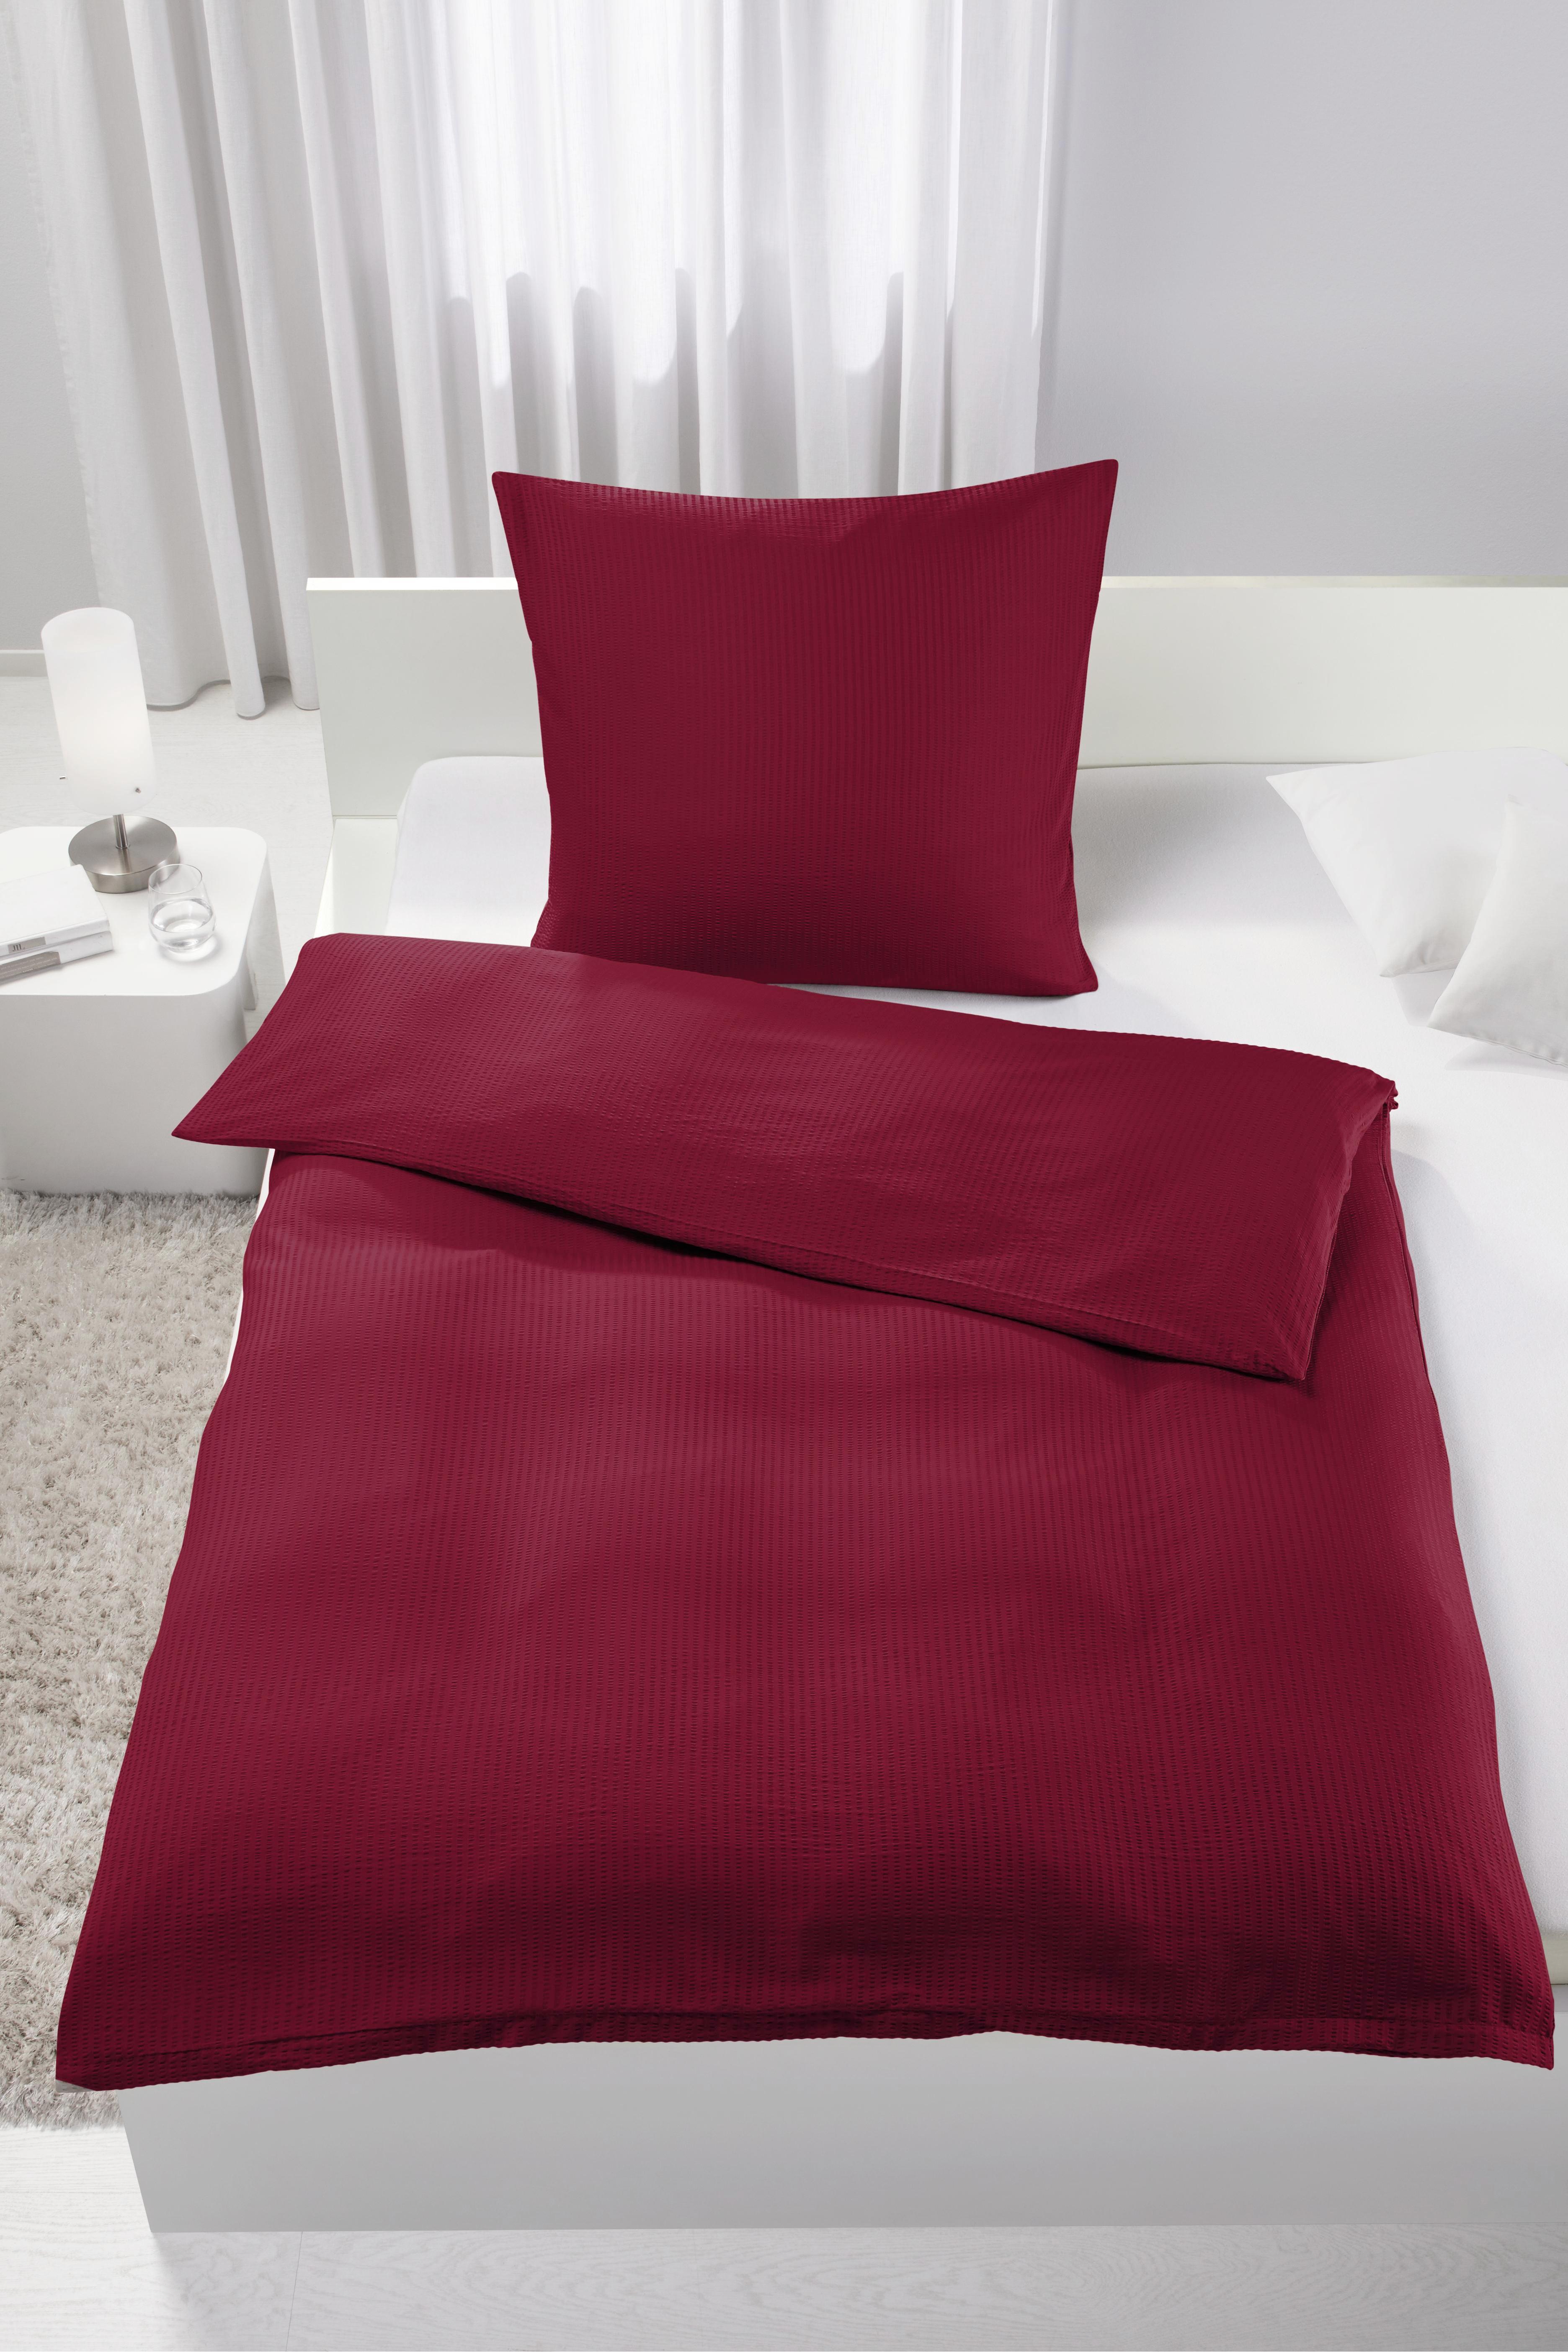 Bettwäsche Brigitte ca. 135x200cm - Rot, Textil (135/200cm) - MÖMAX modern living